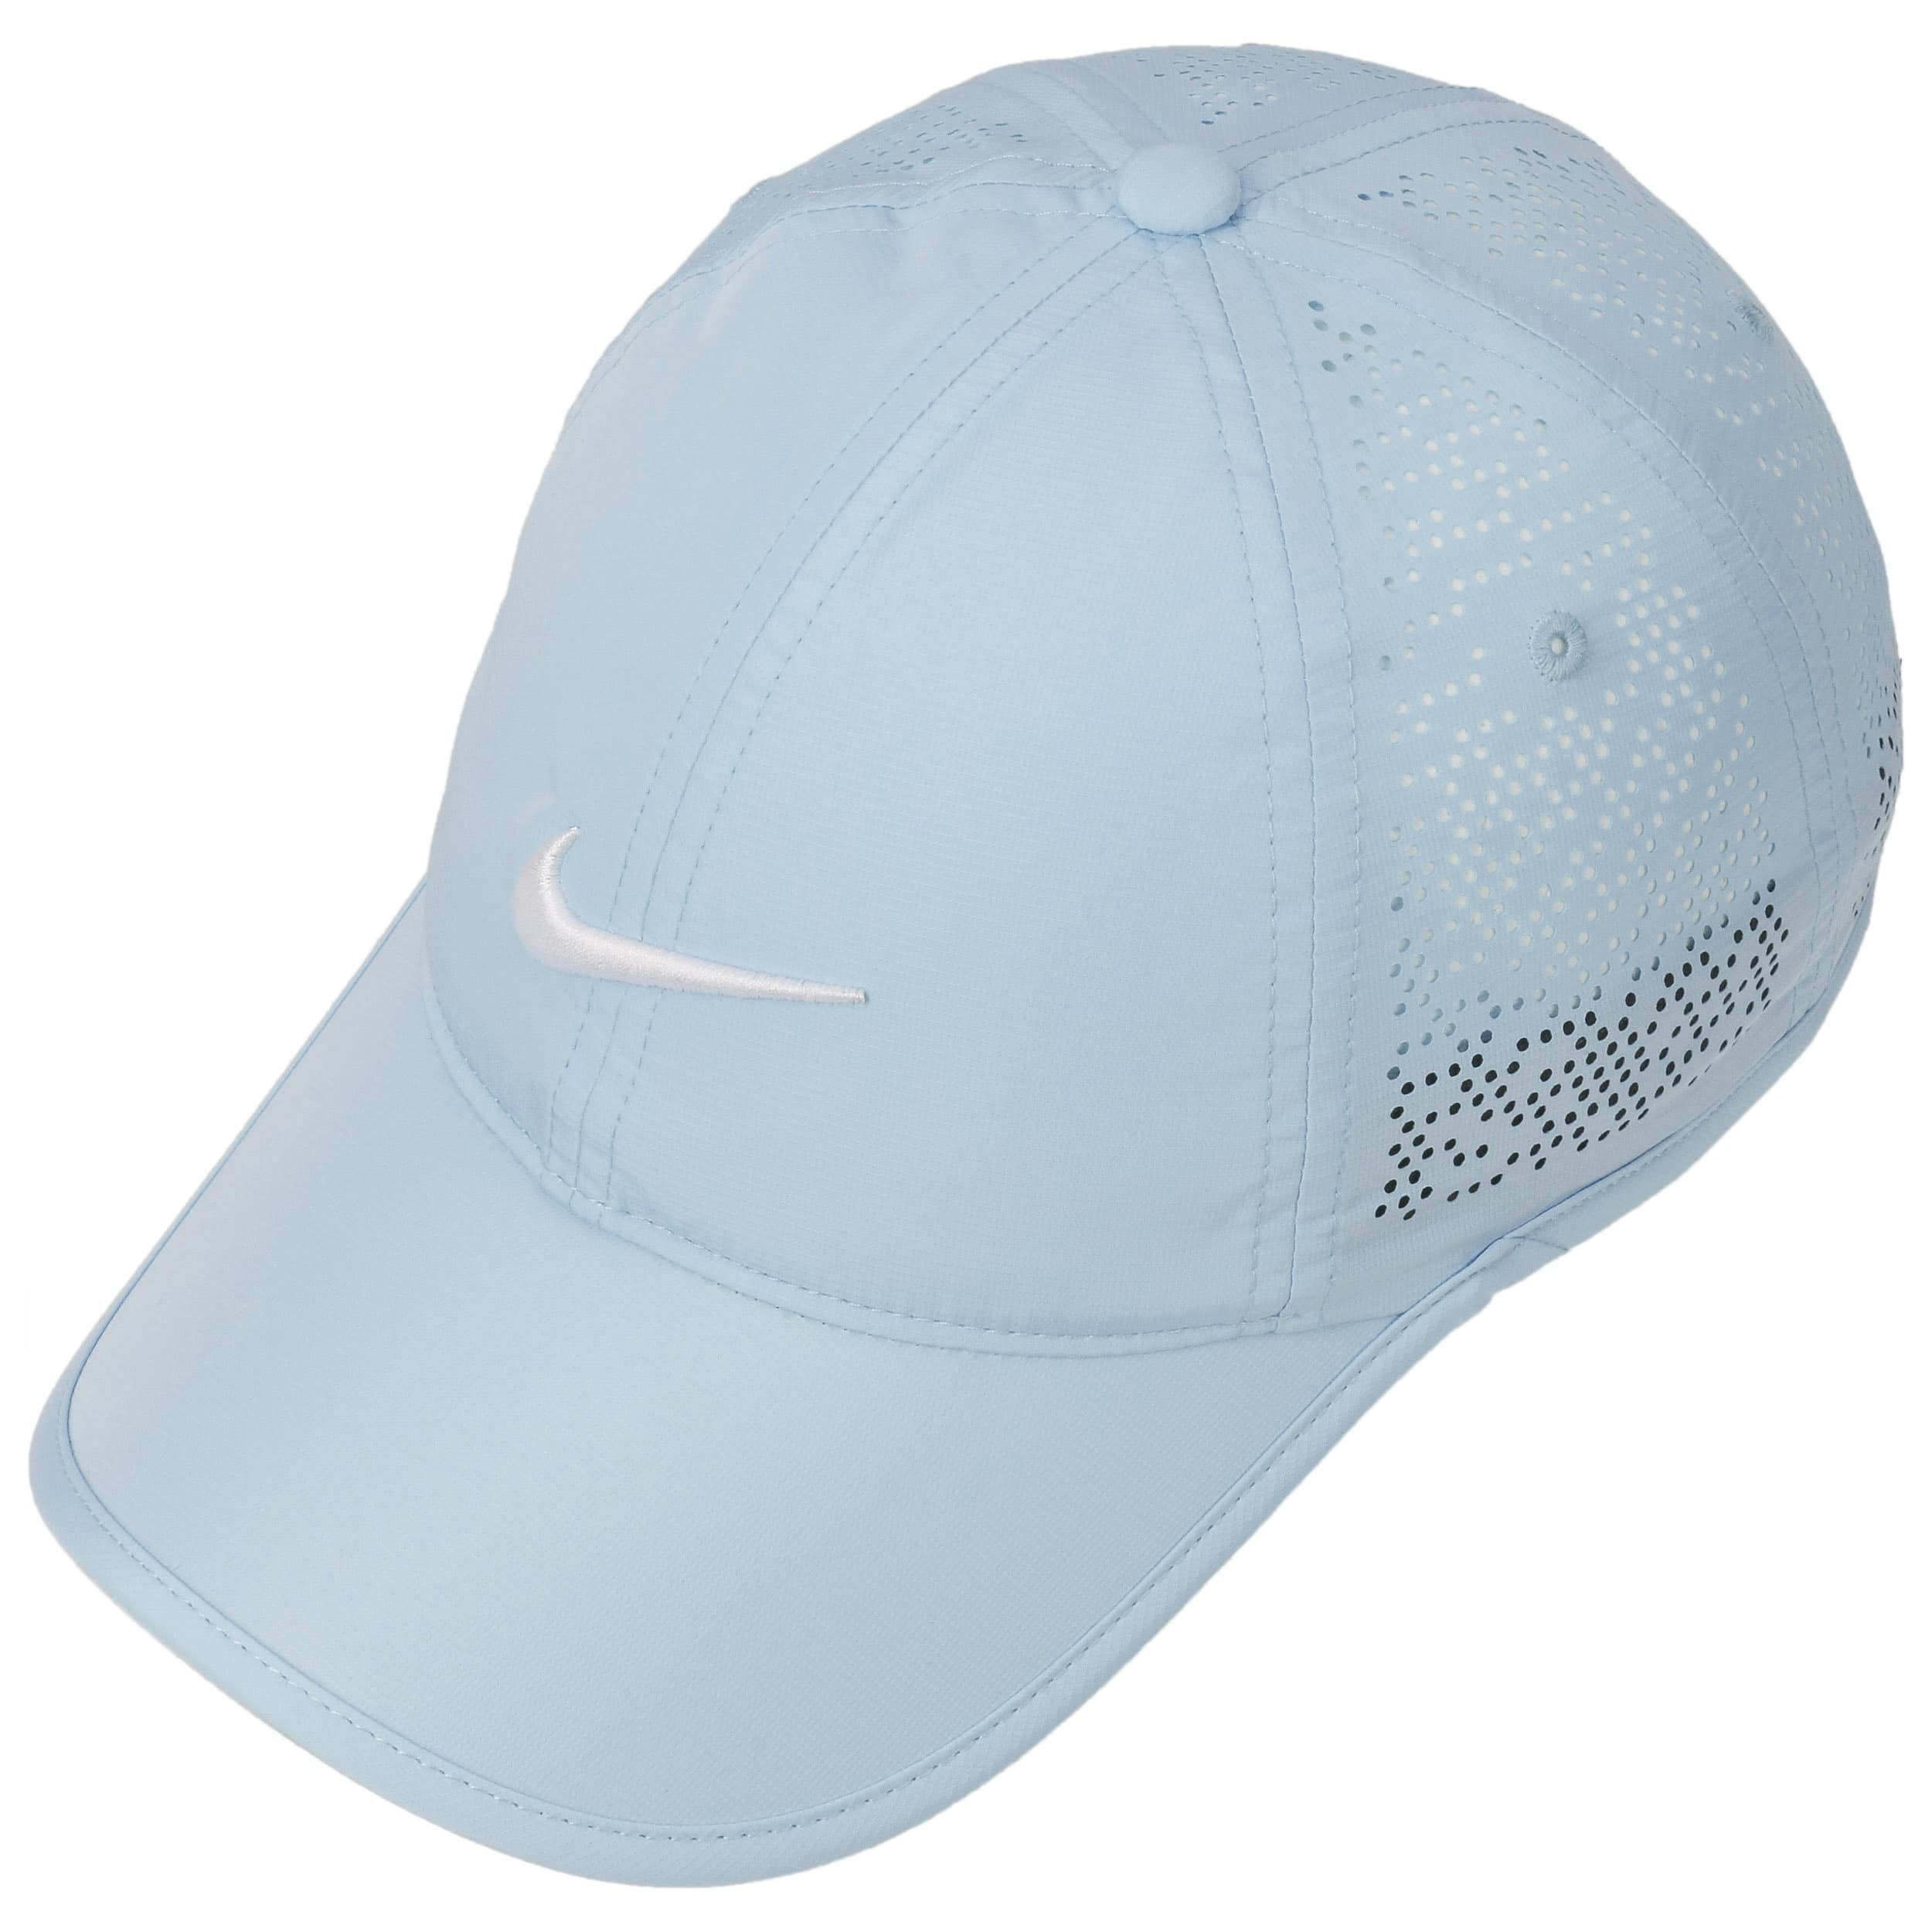 Vendedor Florecer yo  Gorra Swoosh Perforation Cap by Nike - 29,95 €